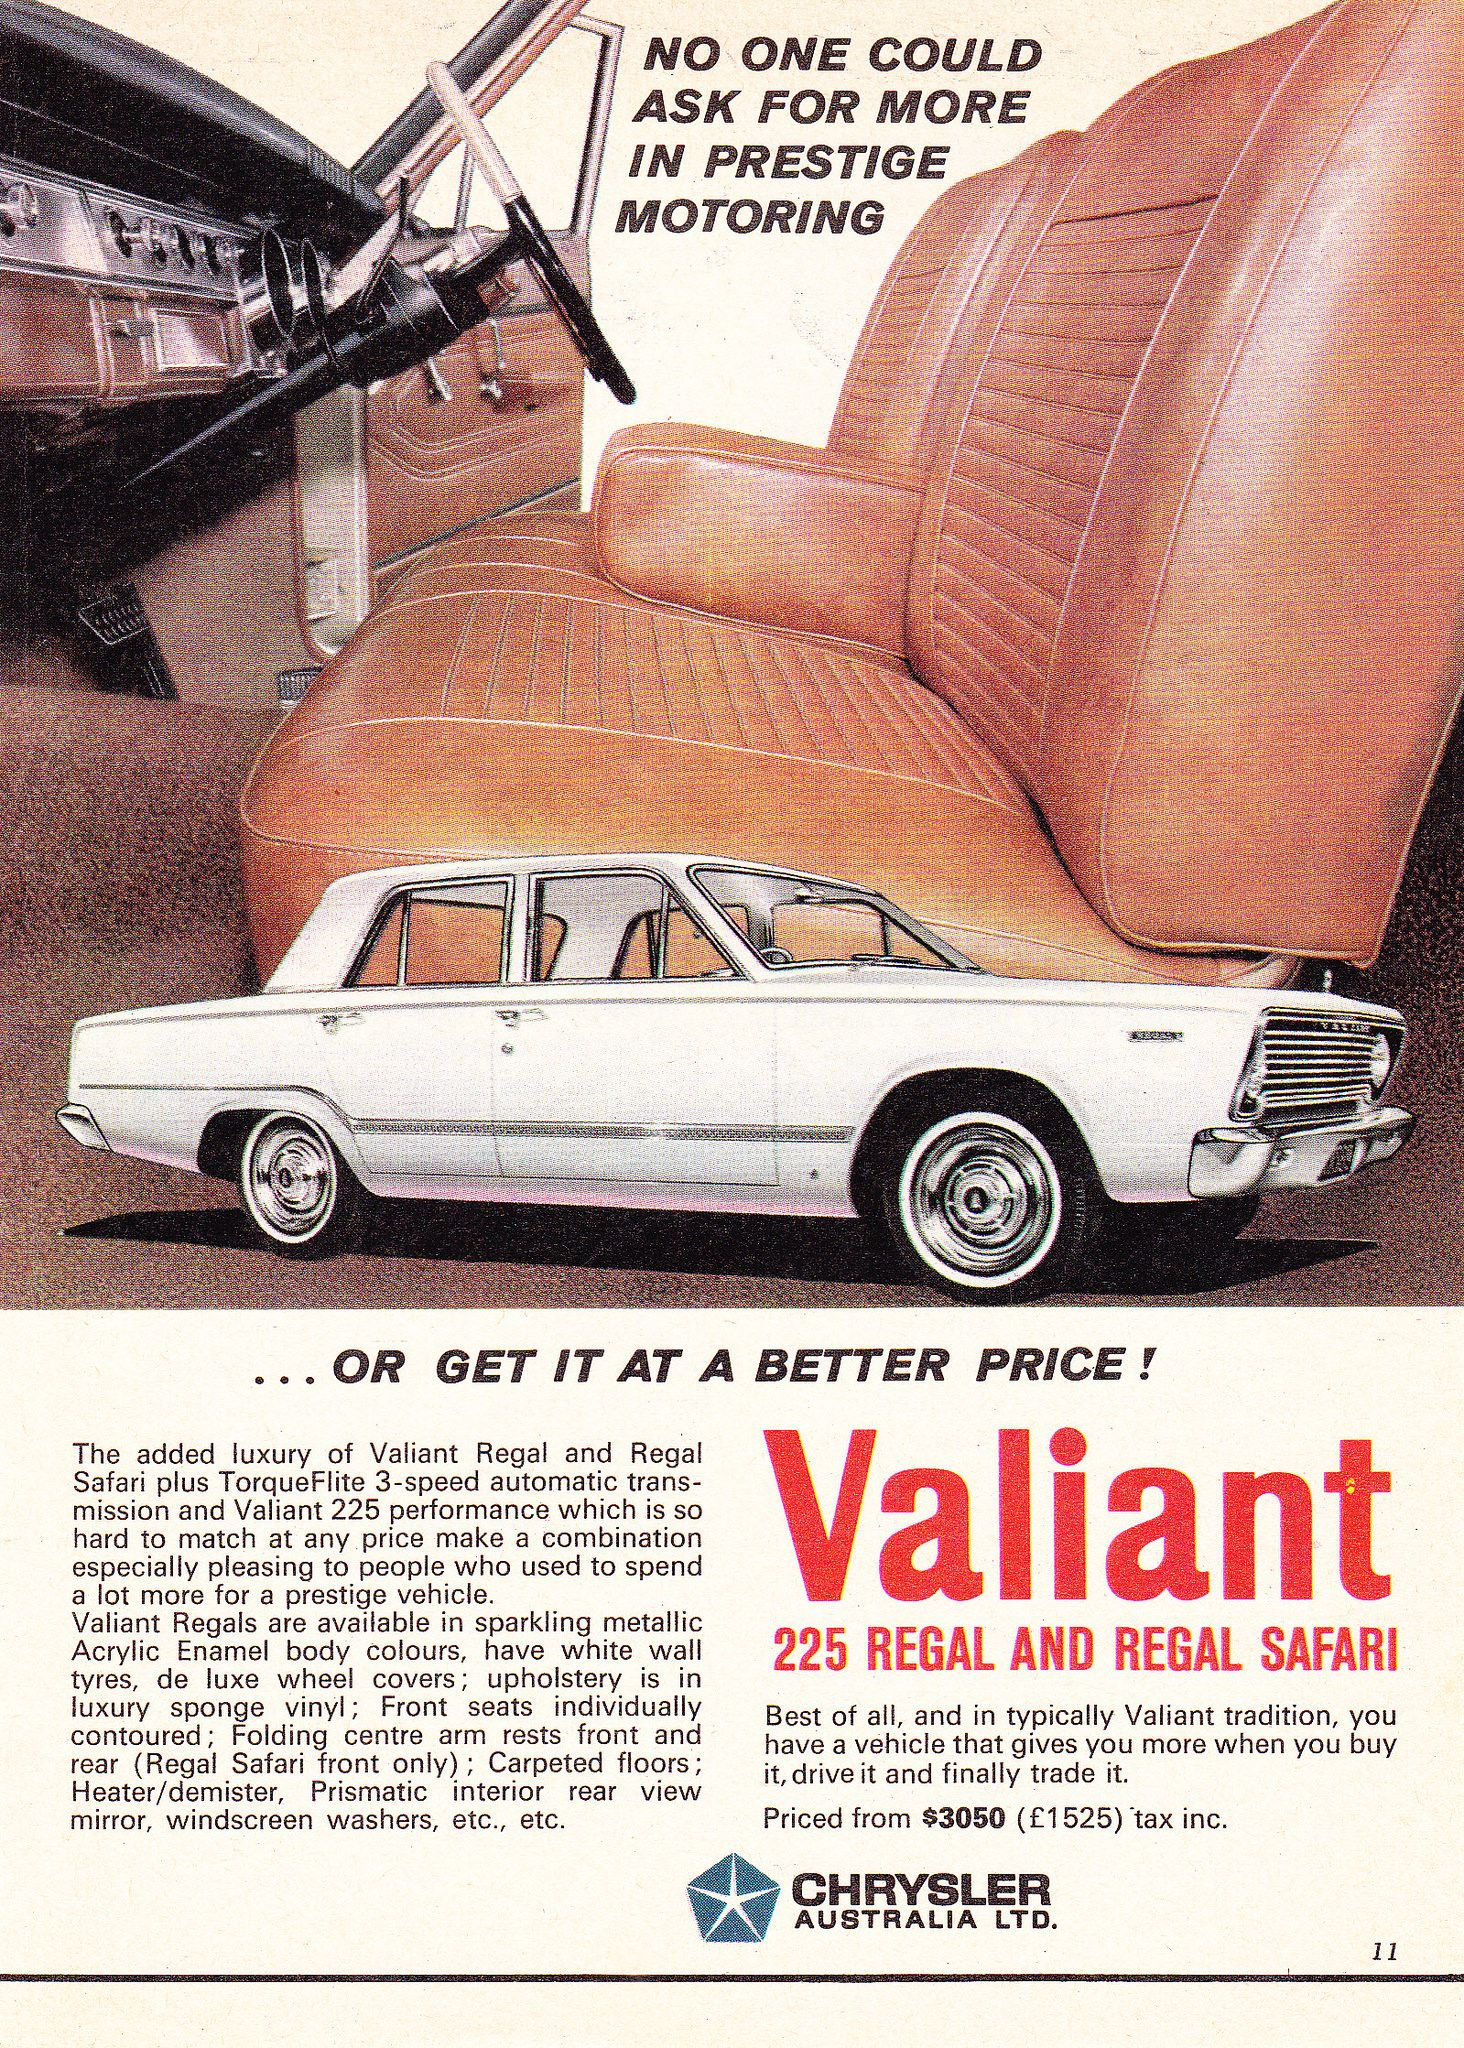 1966 Chrysler VC Valiant Ad Australia t